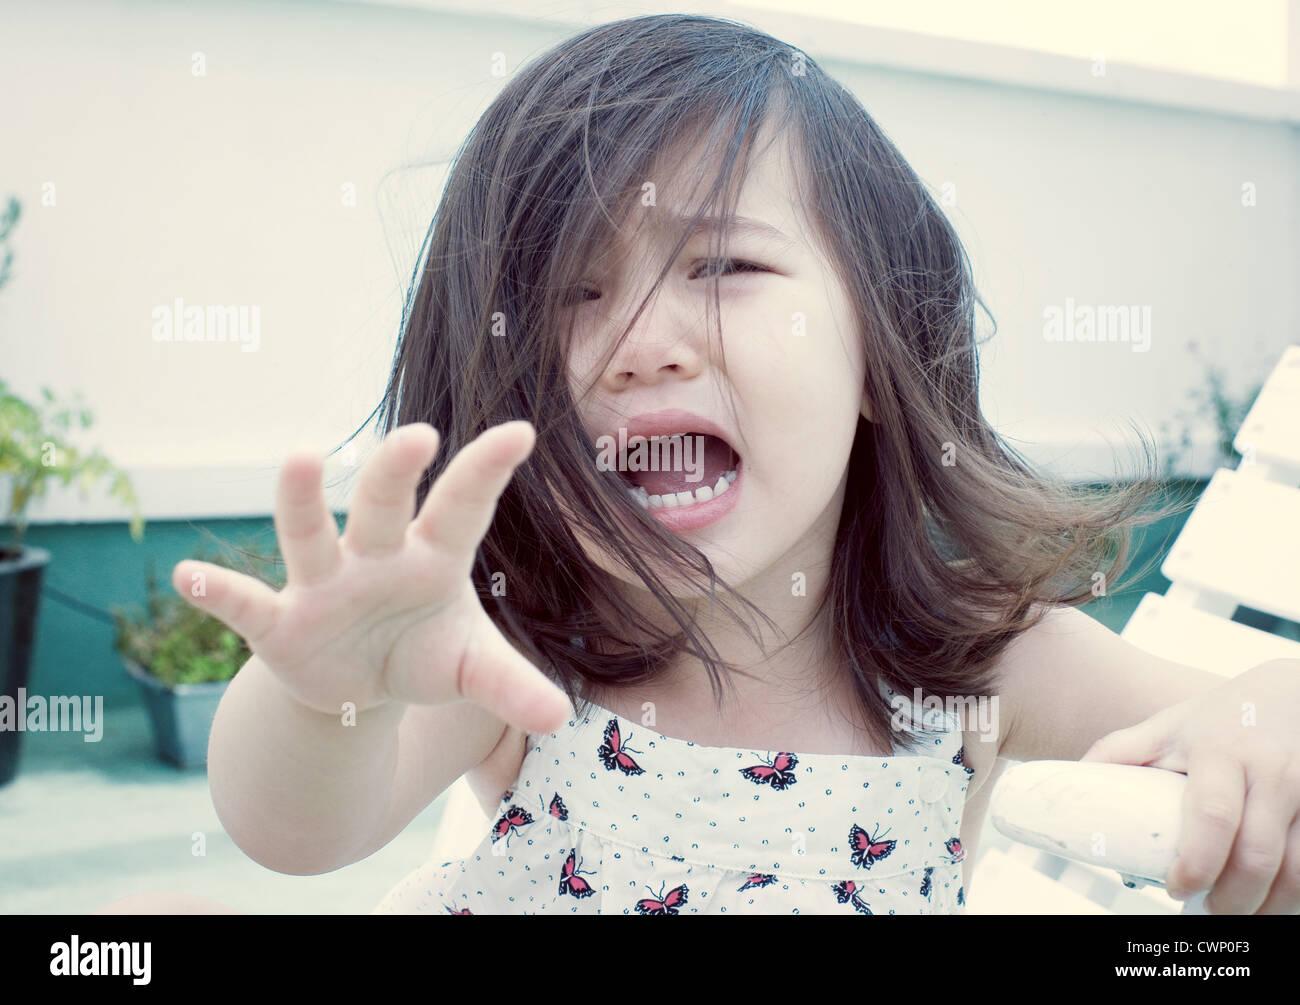 Little girl crying, portrait - Stock Image